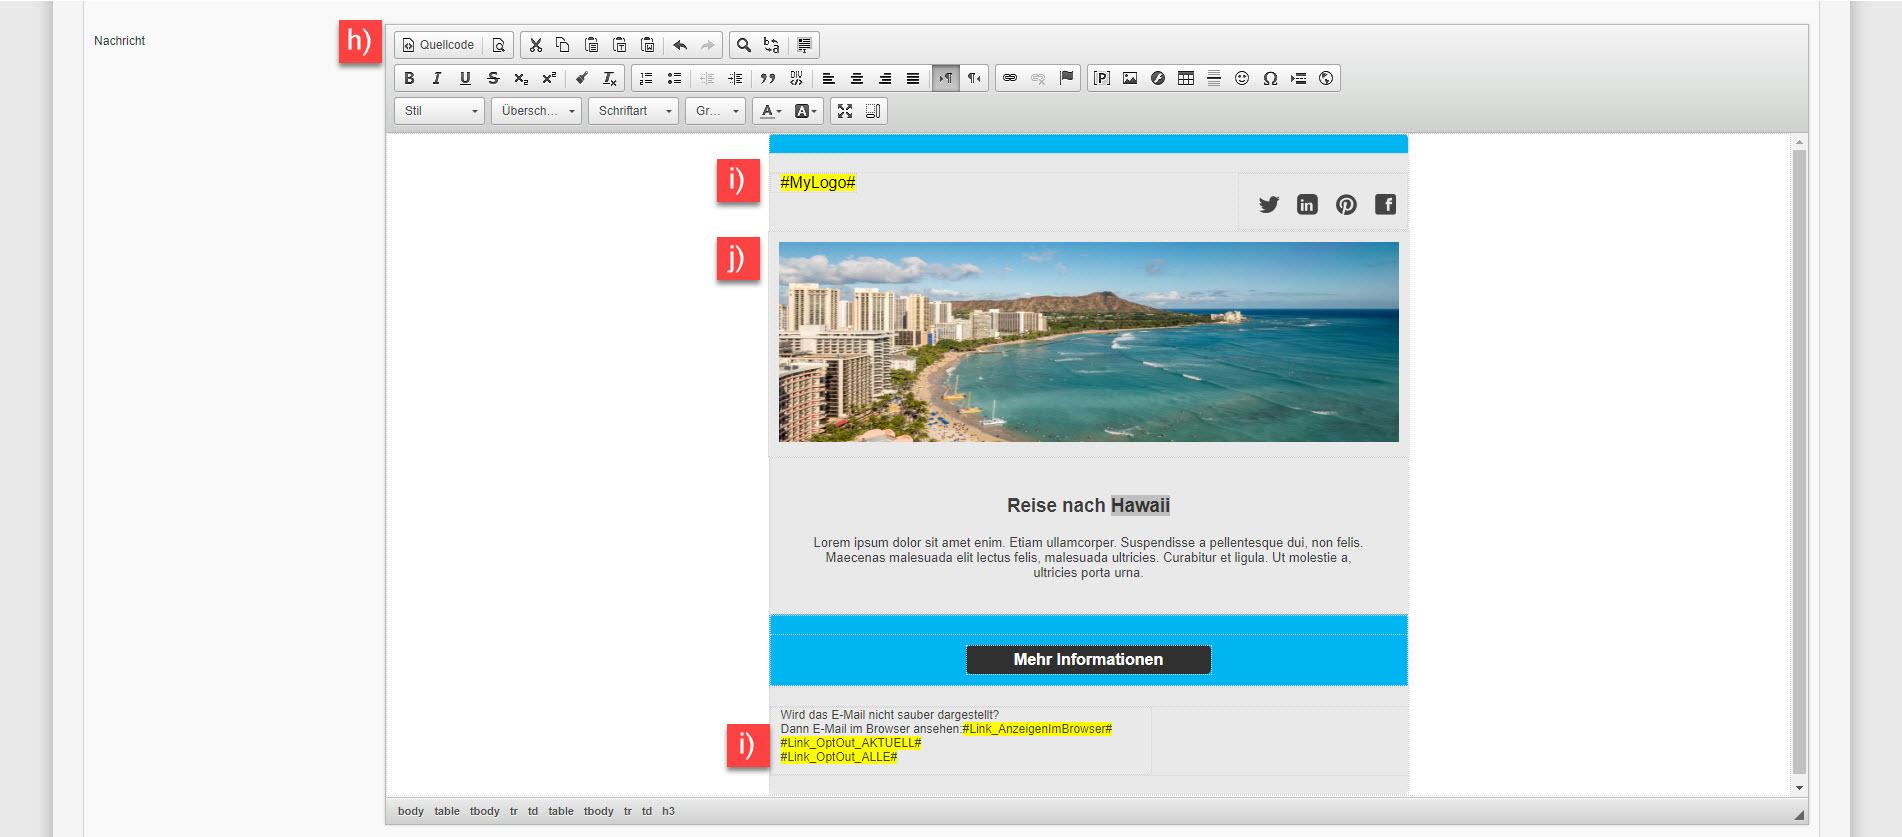 Worldsoft Business Suite Dokumentation